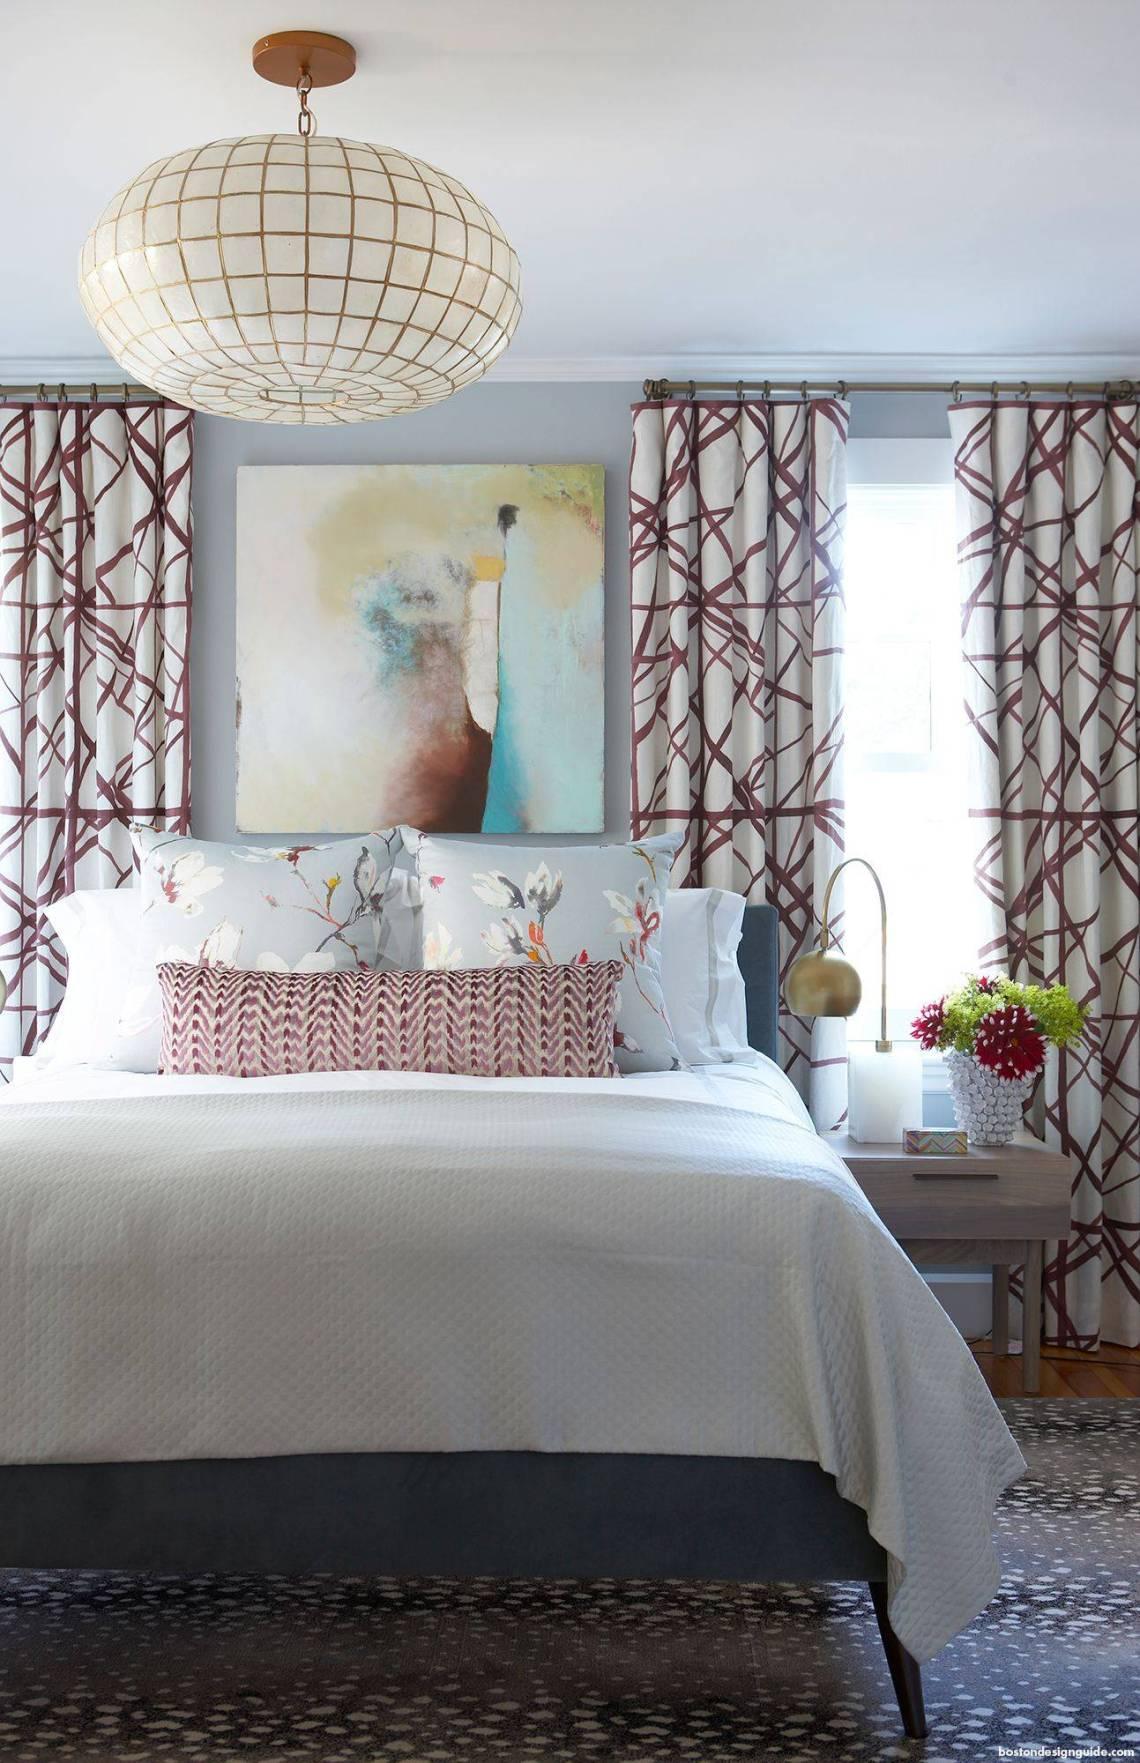 Modern Design for Small Bedroom | Home Design